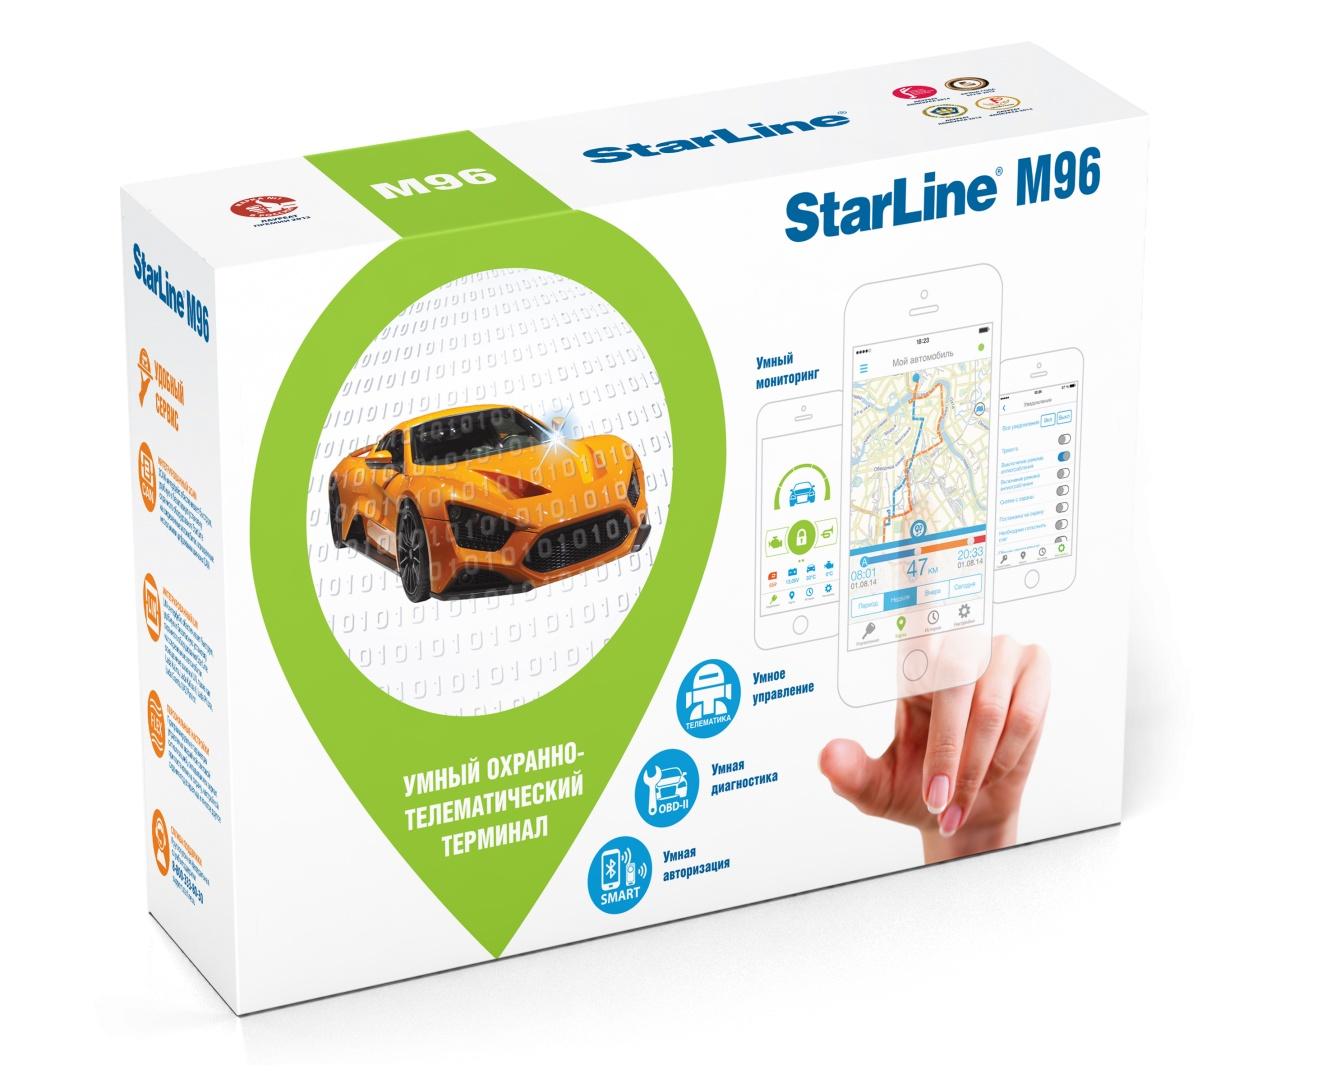 Охранно-телематический комплекc StarLine M96 M